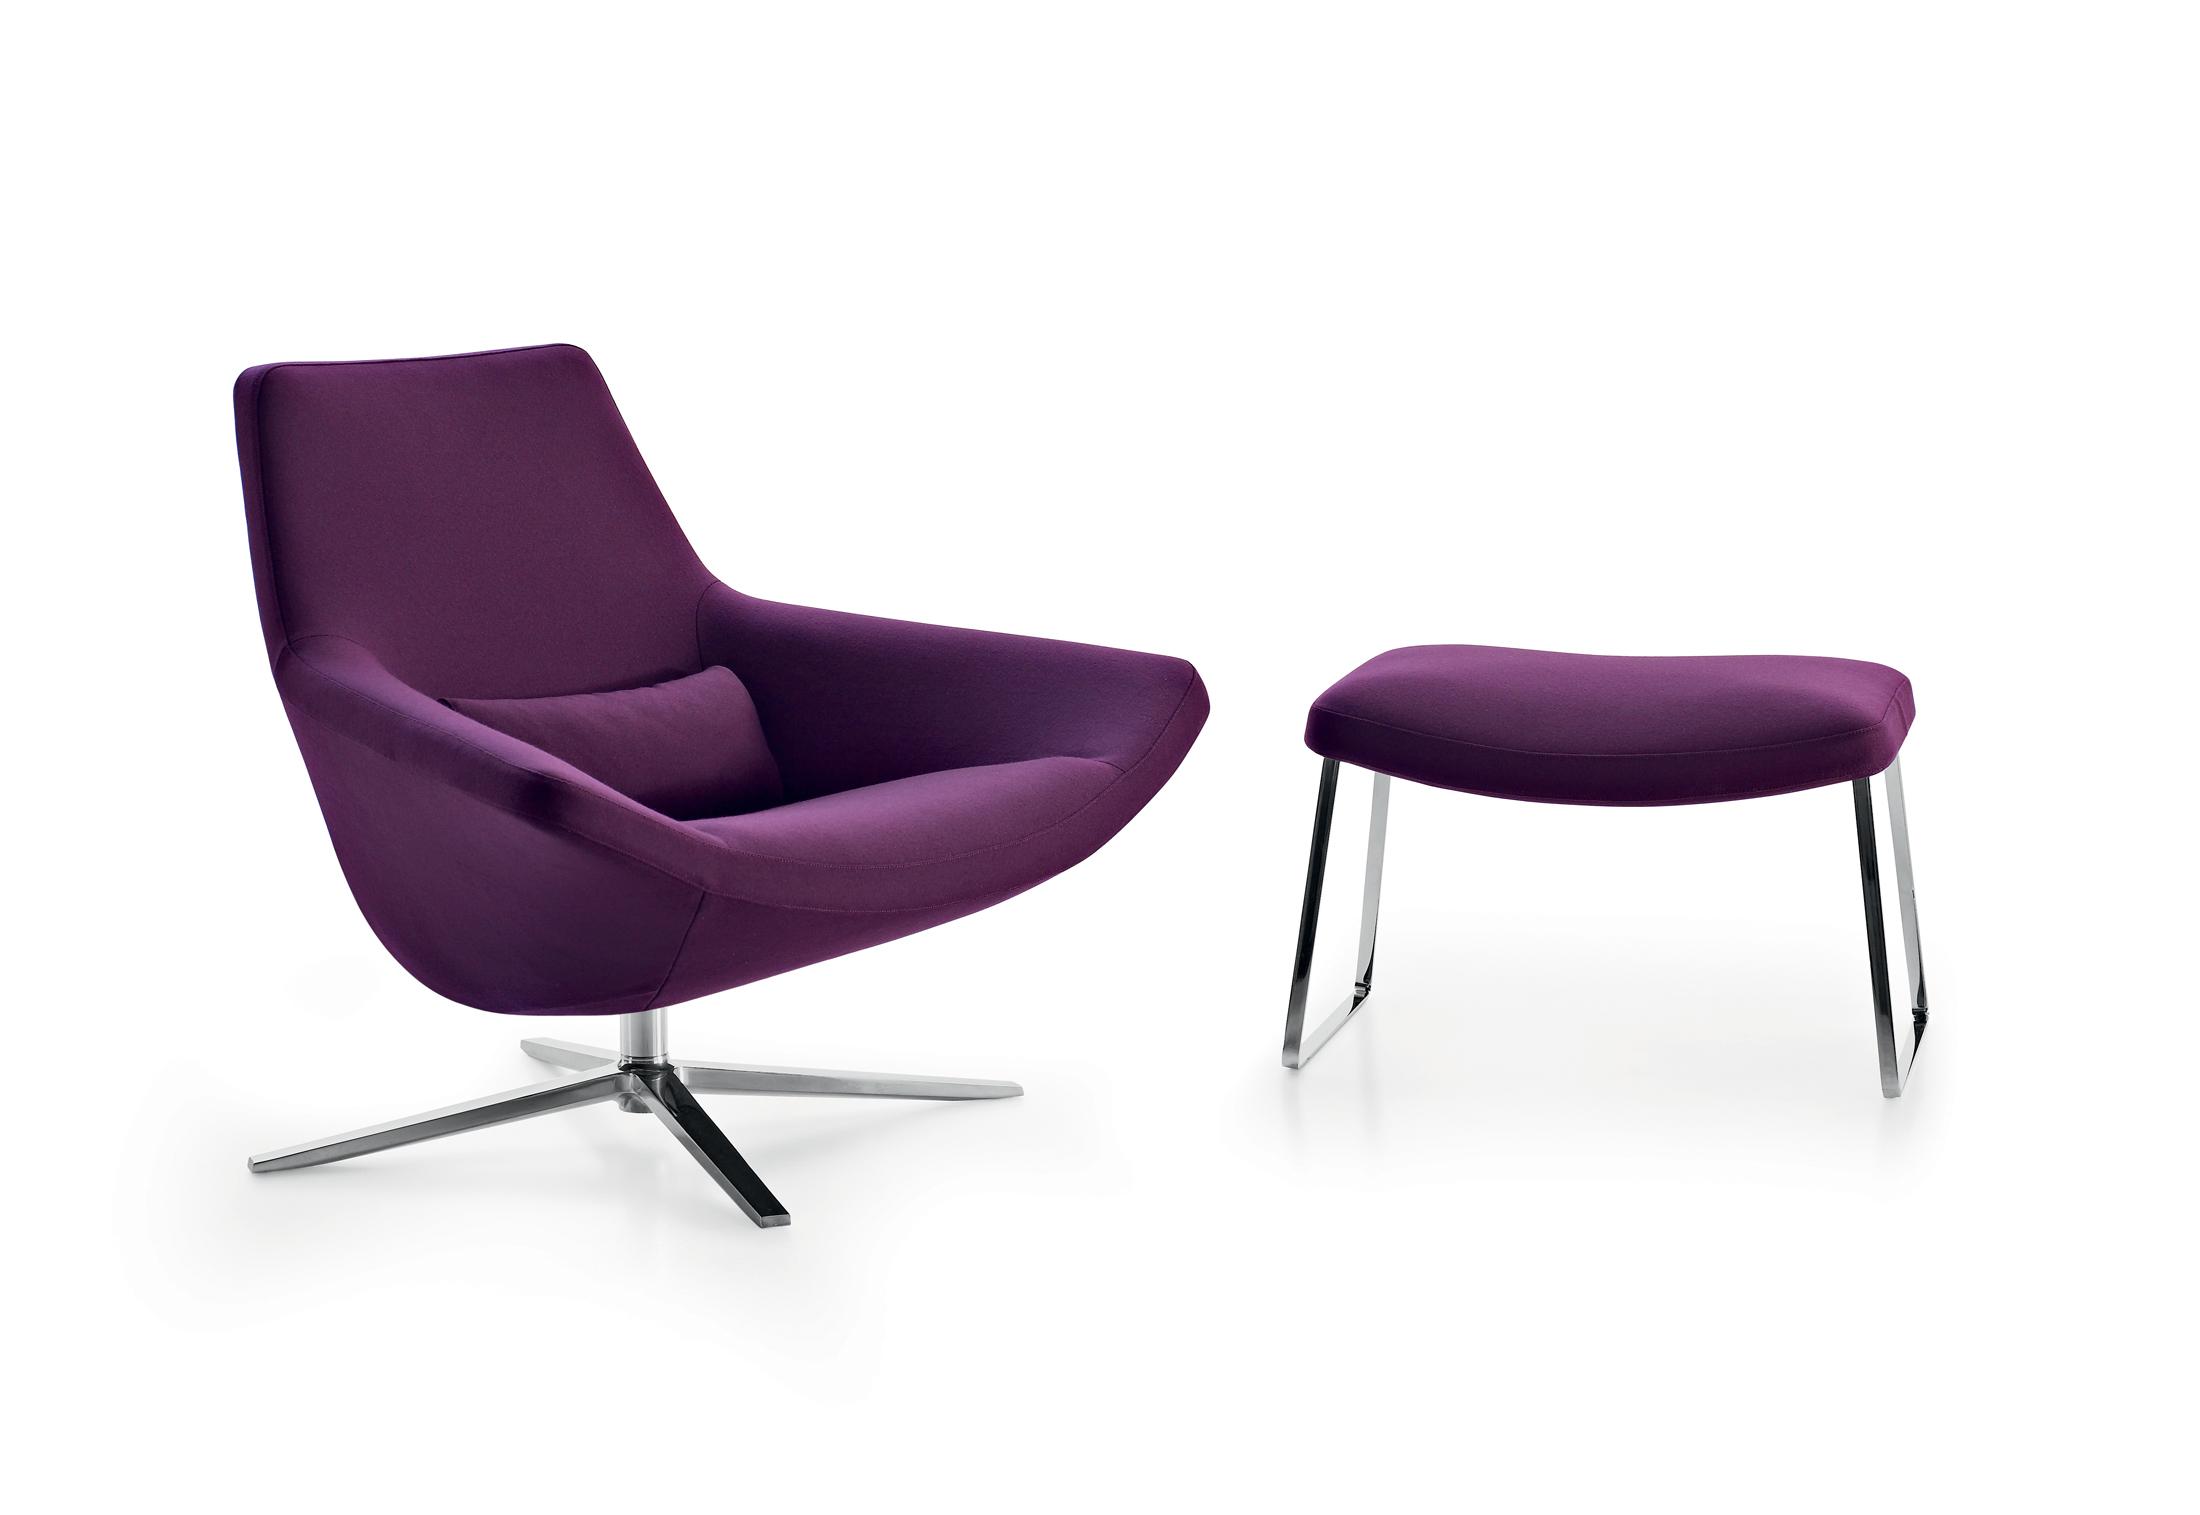 metropolitan 14 sessel von b b italia stylepark. Black Bedroom Furniture Sets. Home Design Ideas